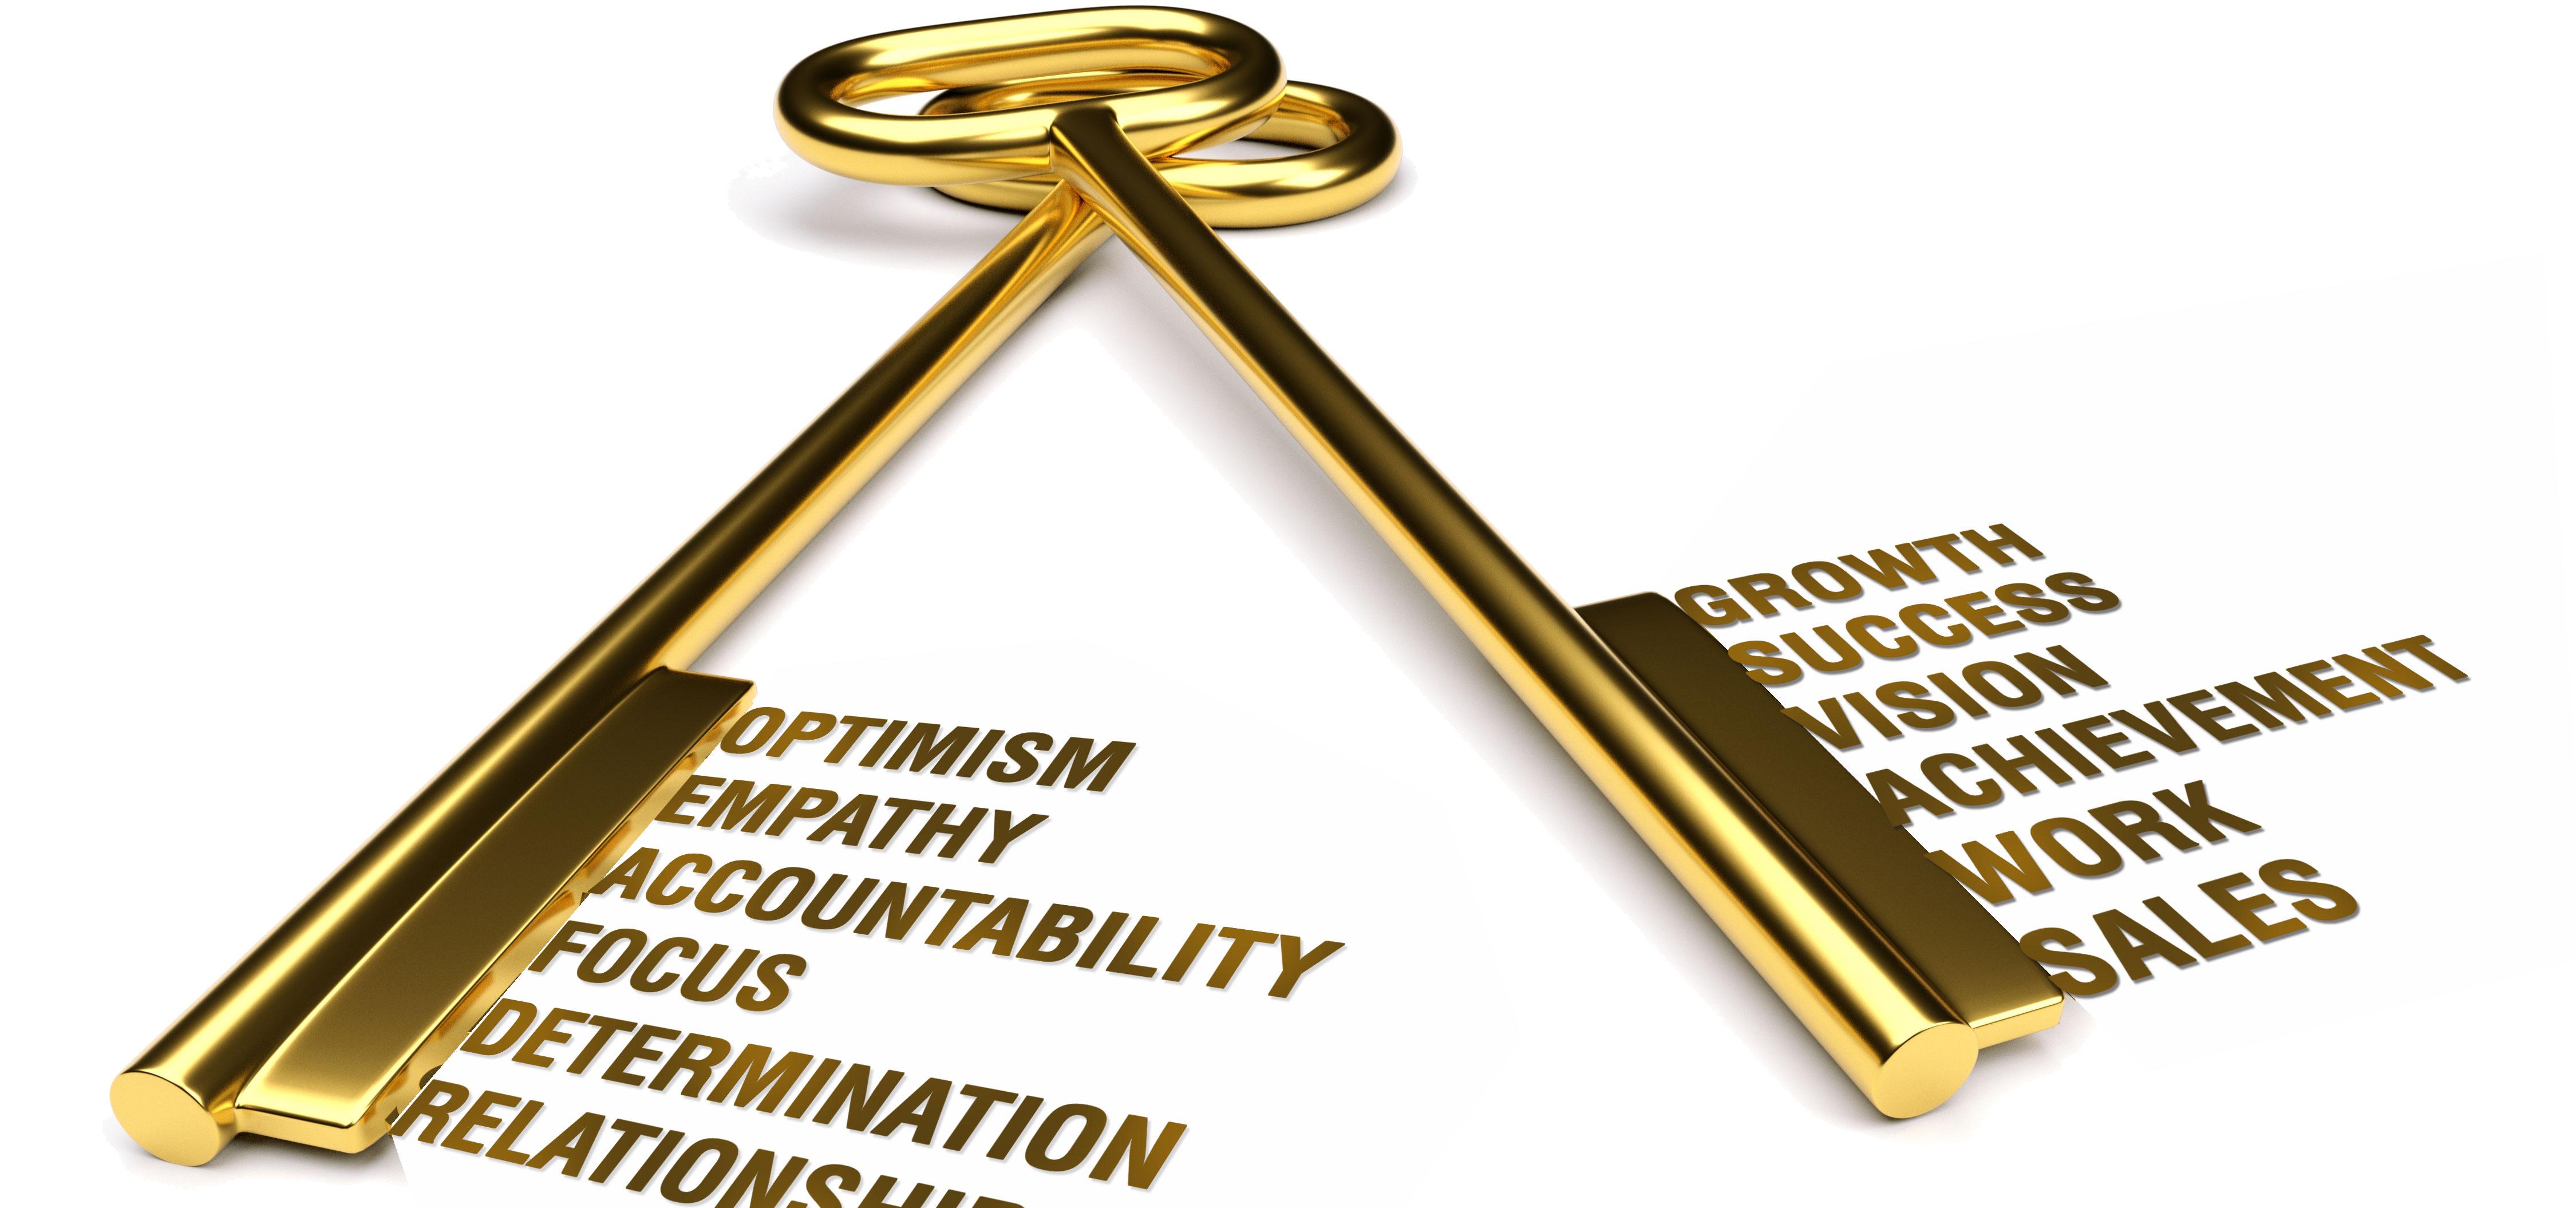 Key qualities